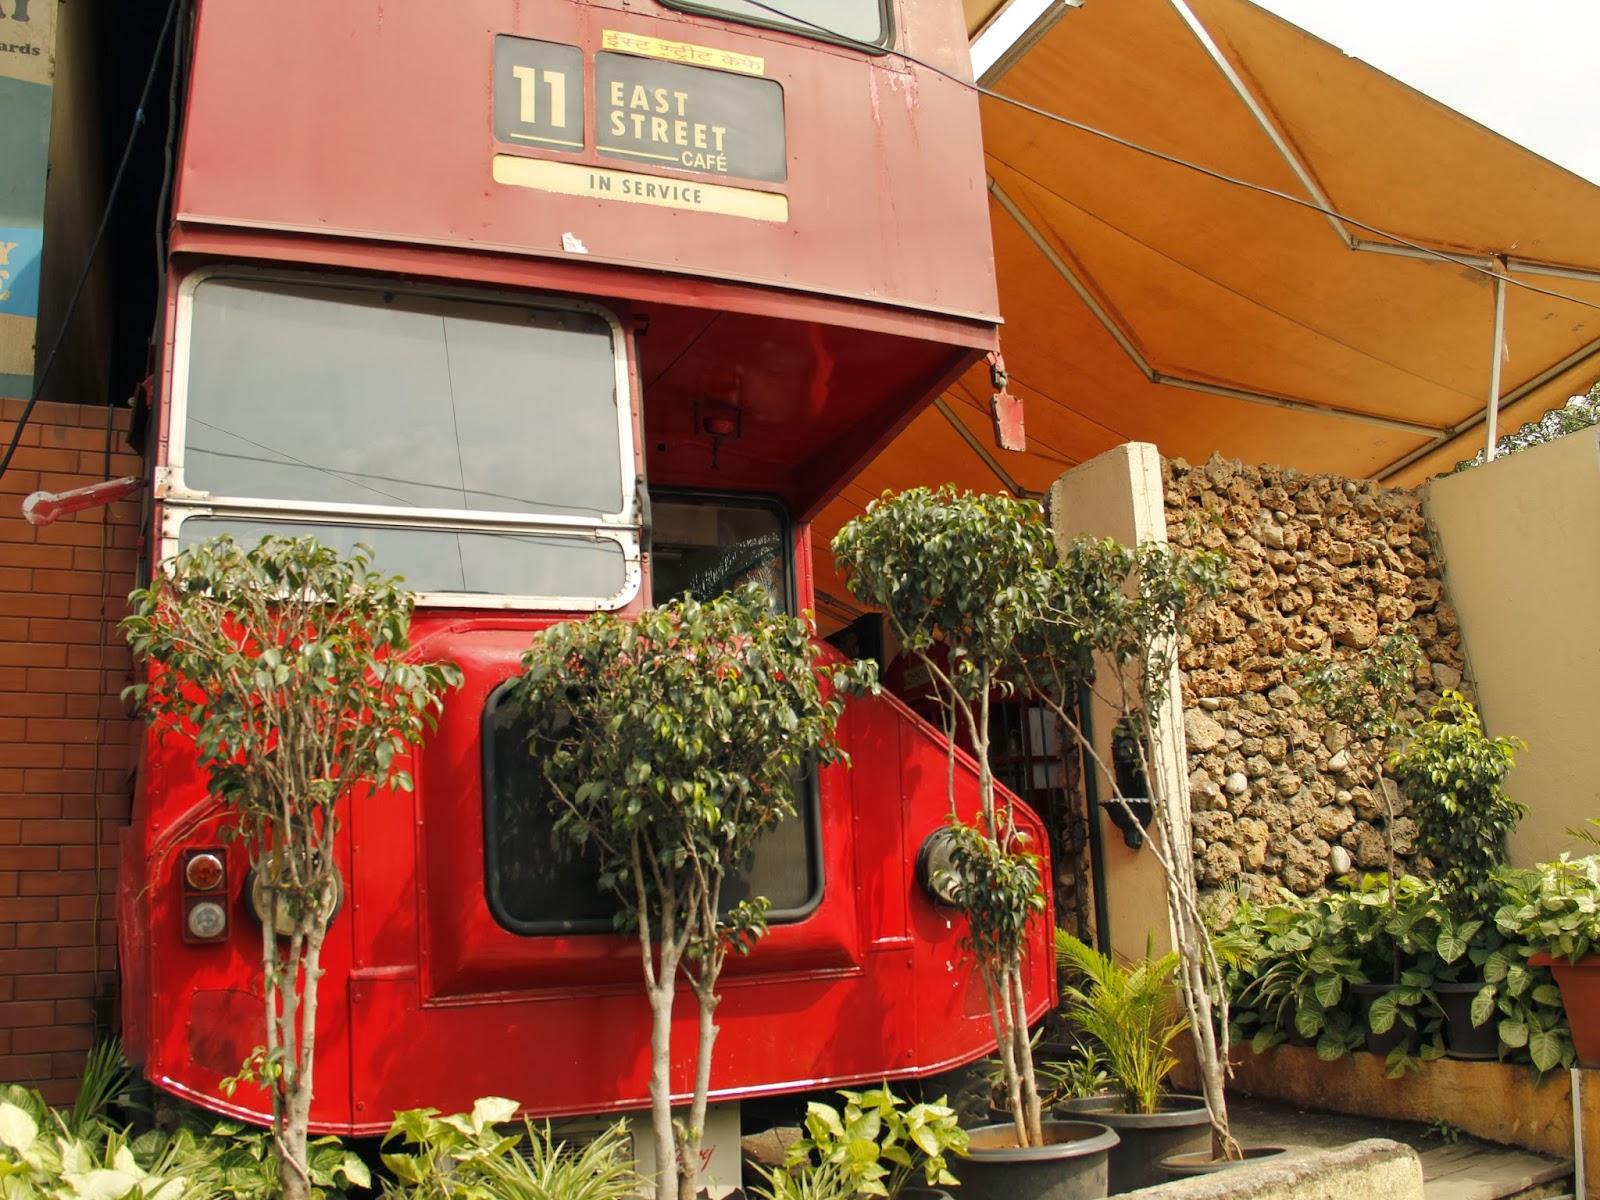 Morrisons kopparberg mixed fruits 250ml product information - Restaurant Review 11 East Street Multi Cuisine